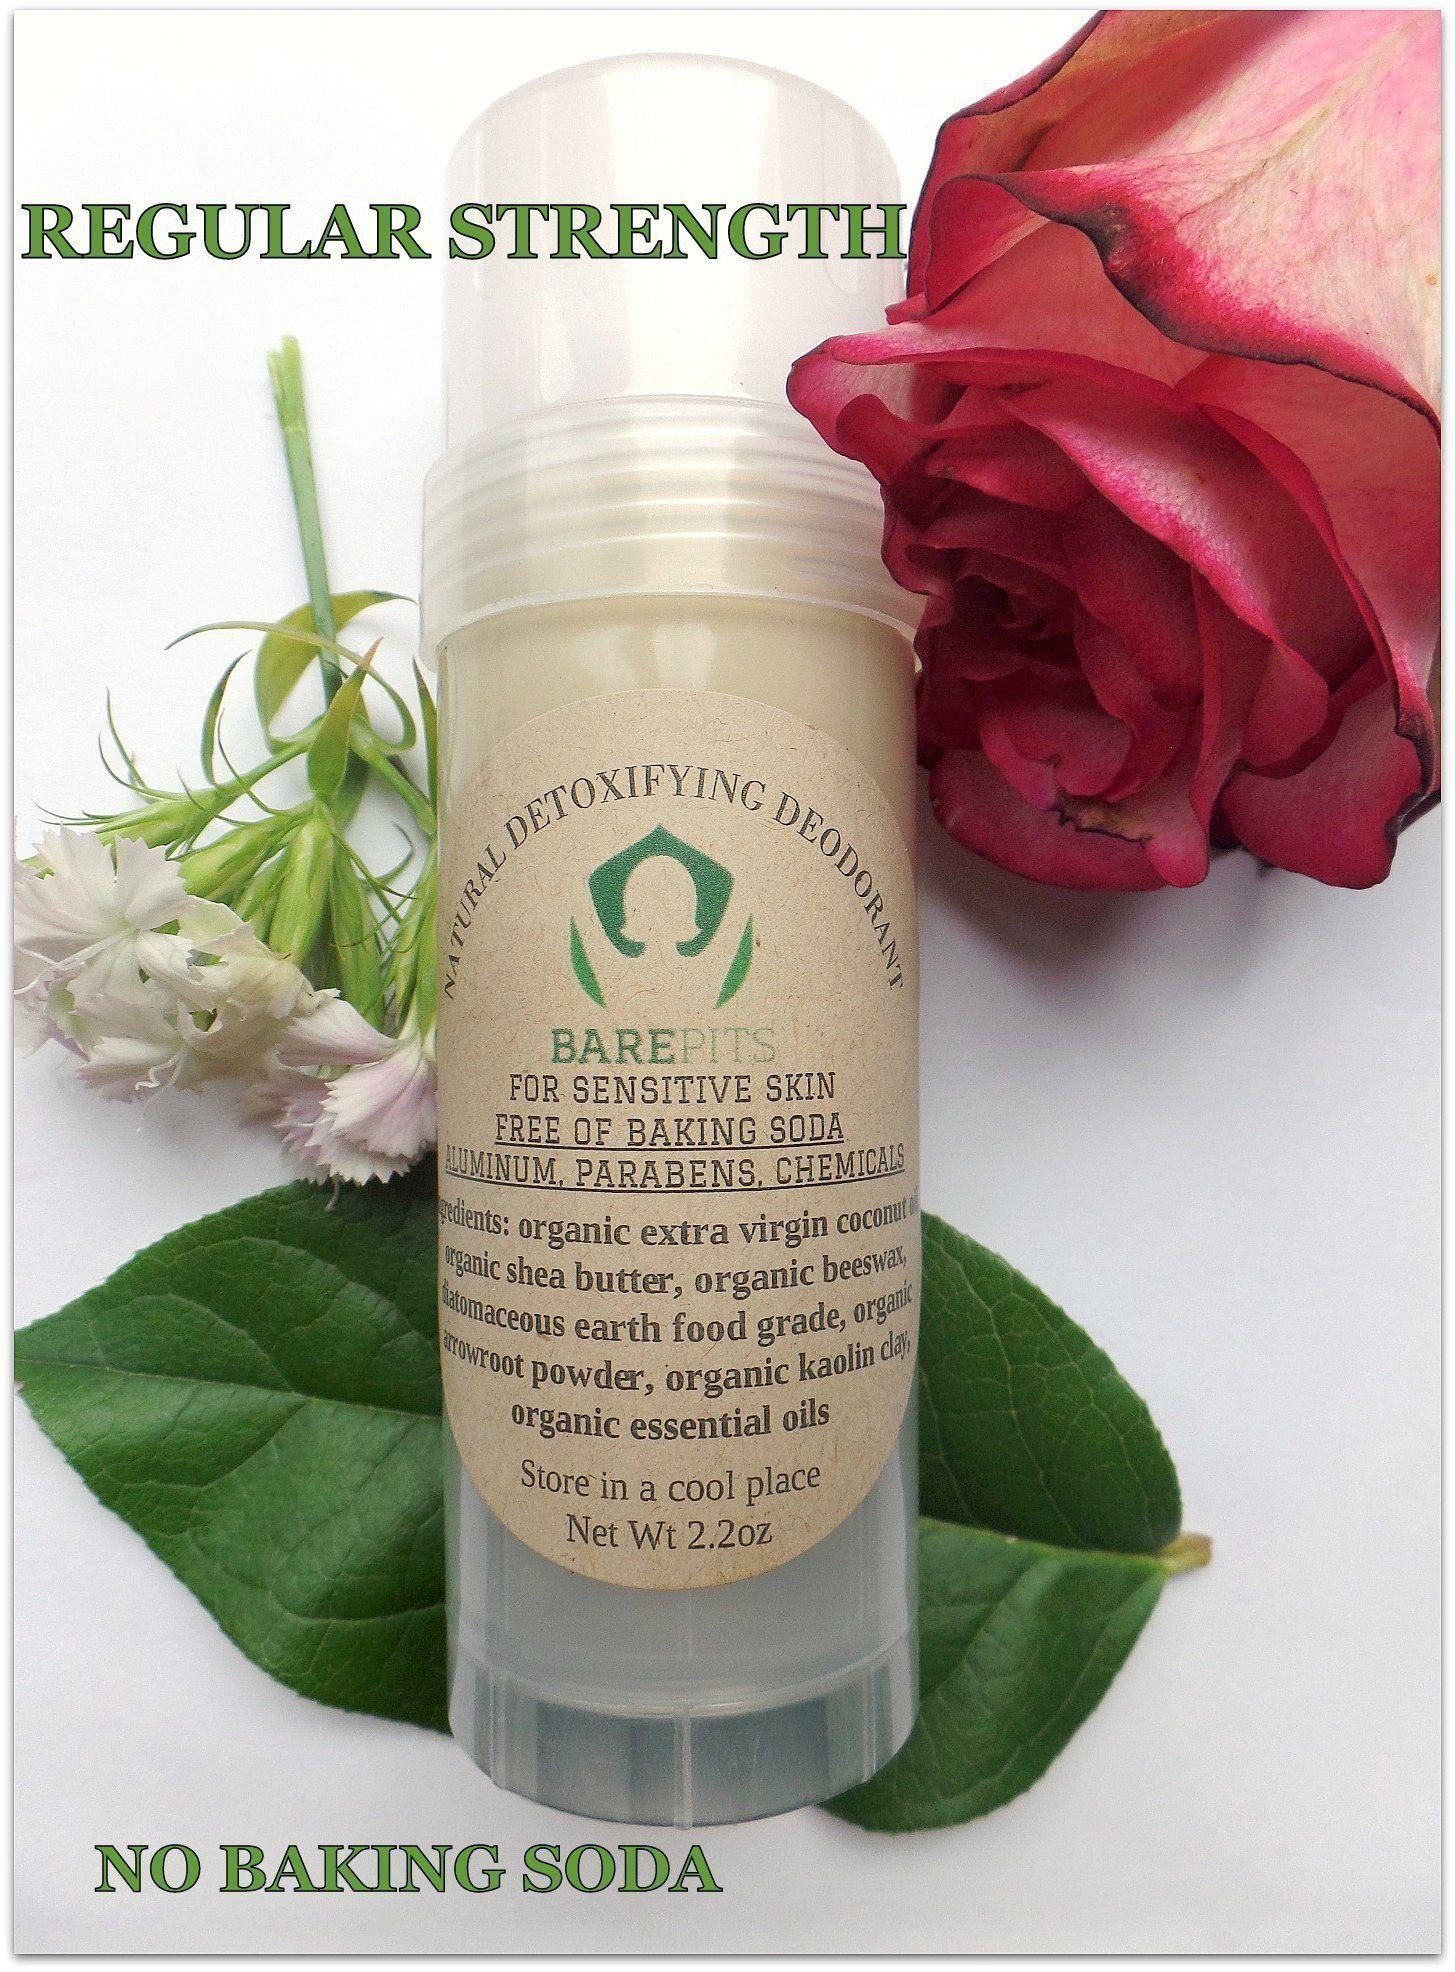 bare pits natural organic detox deodorant regular strength 2 2 oz